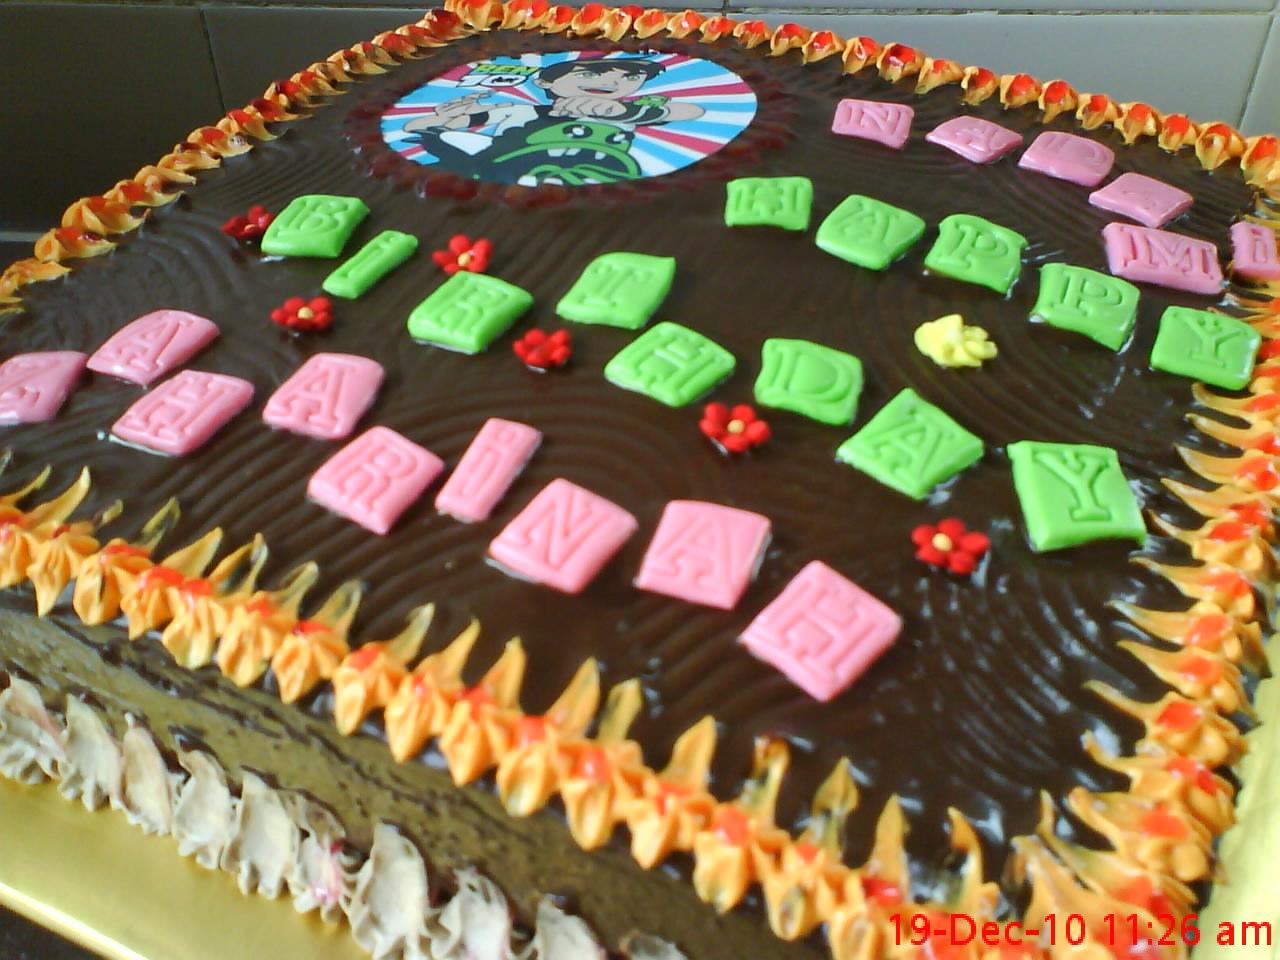 ADNAZTHIE-KEK: Kek coklat lembap untuk birthday Zaharinah dan anaknya ...